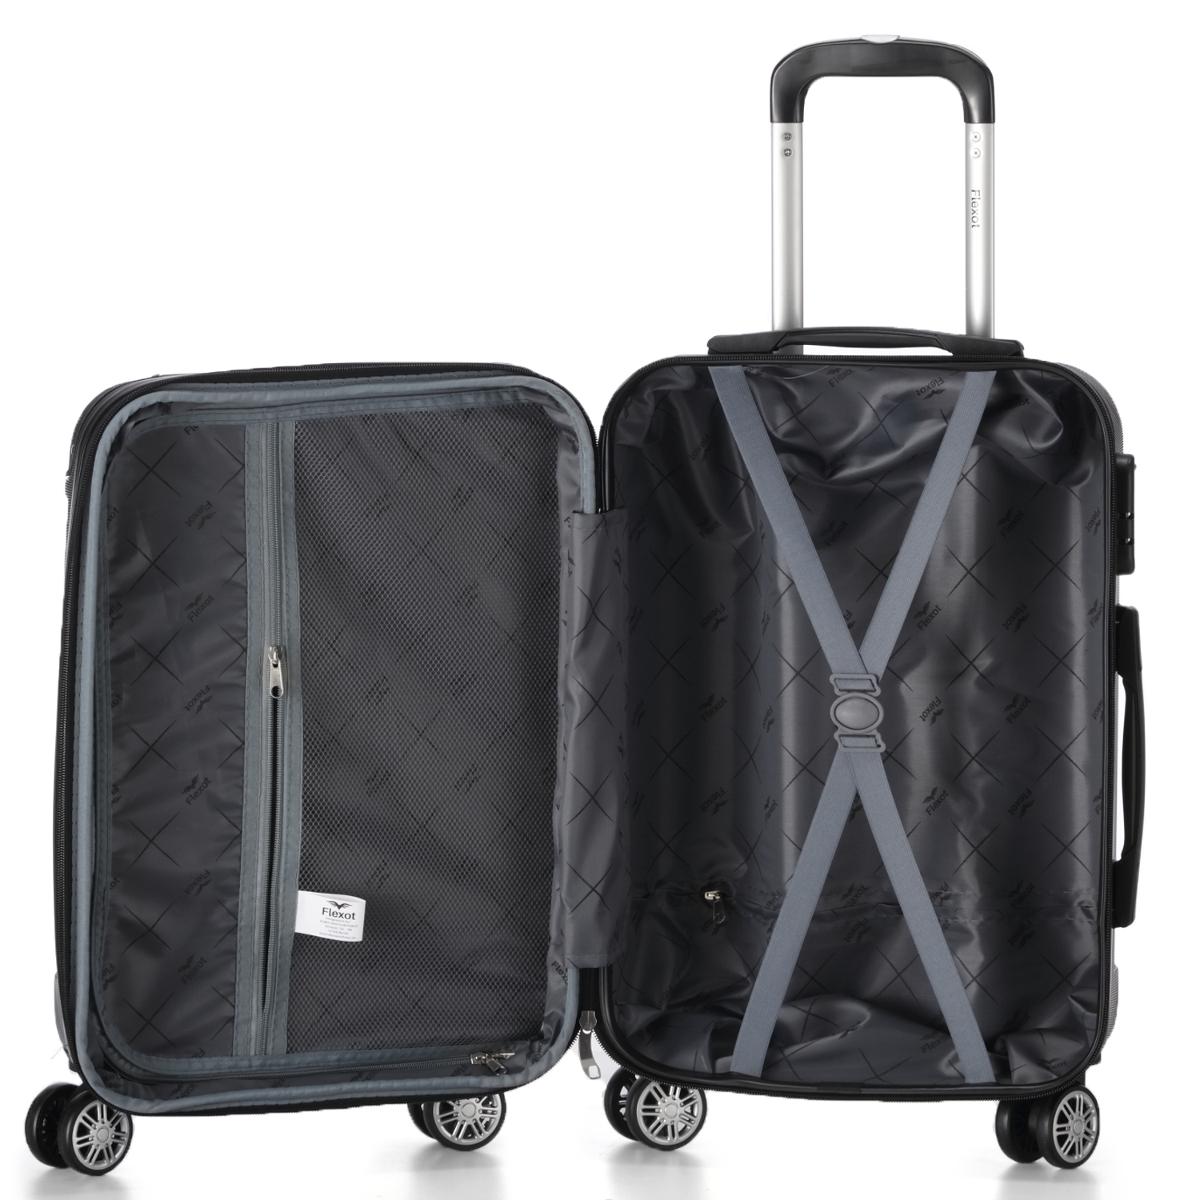 Koffer-Flexot-2045-Hartschalenkoffer-Trolley-Kofferset-Reisekoffer-M-L-XL-Set Indexbild 39